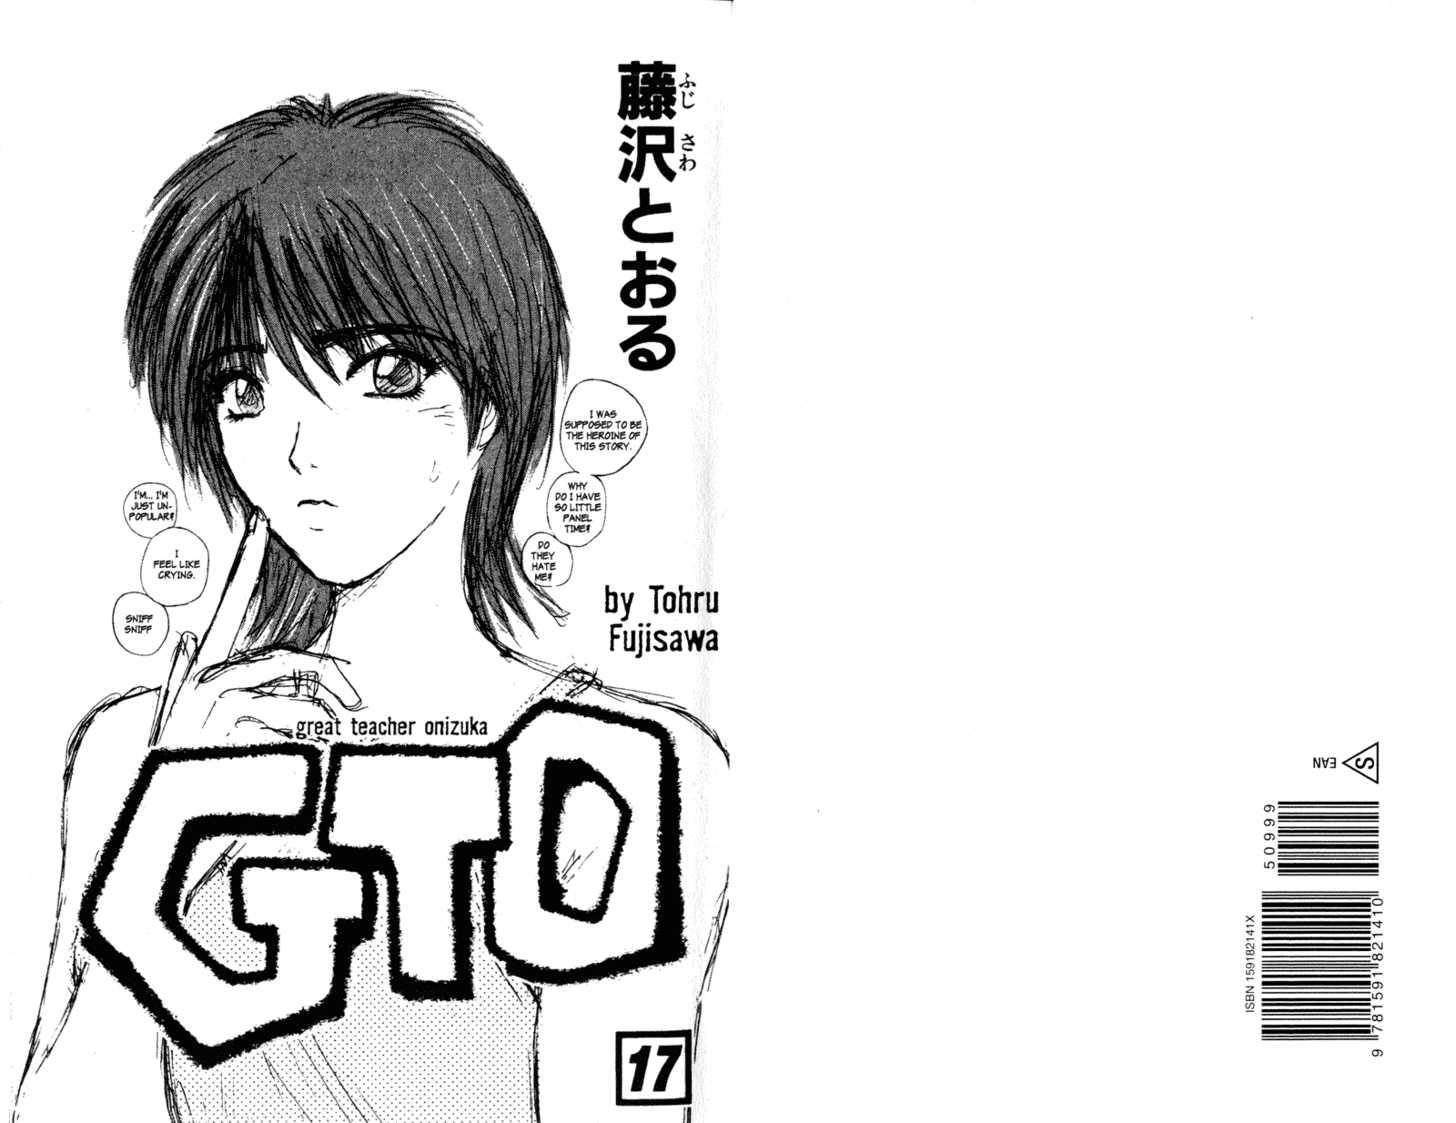 Great Teacher Onizuka 133 Page 1